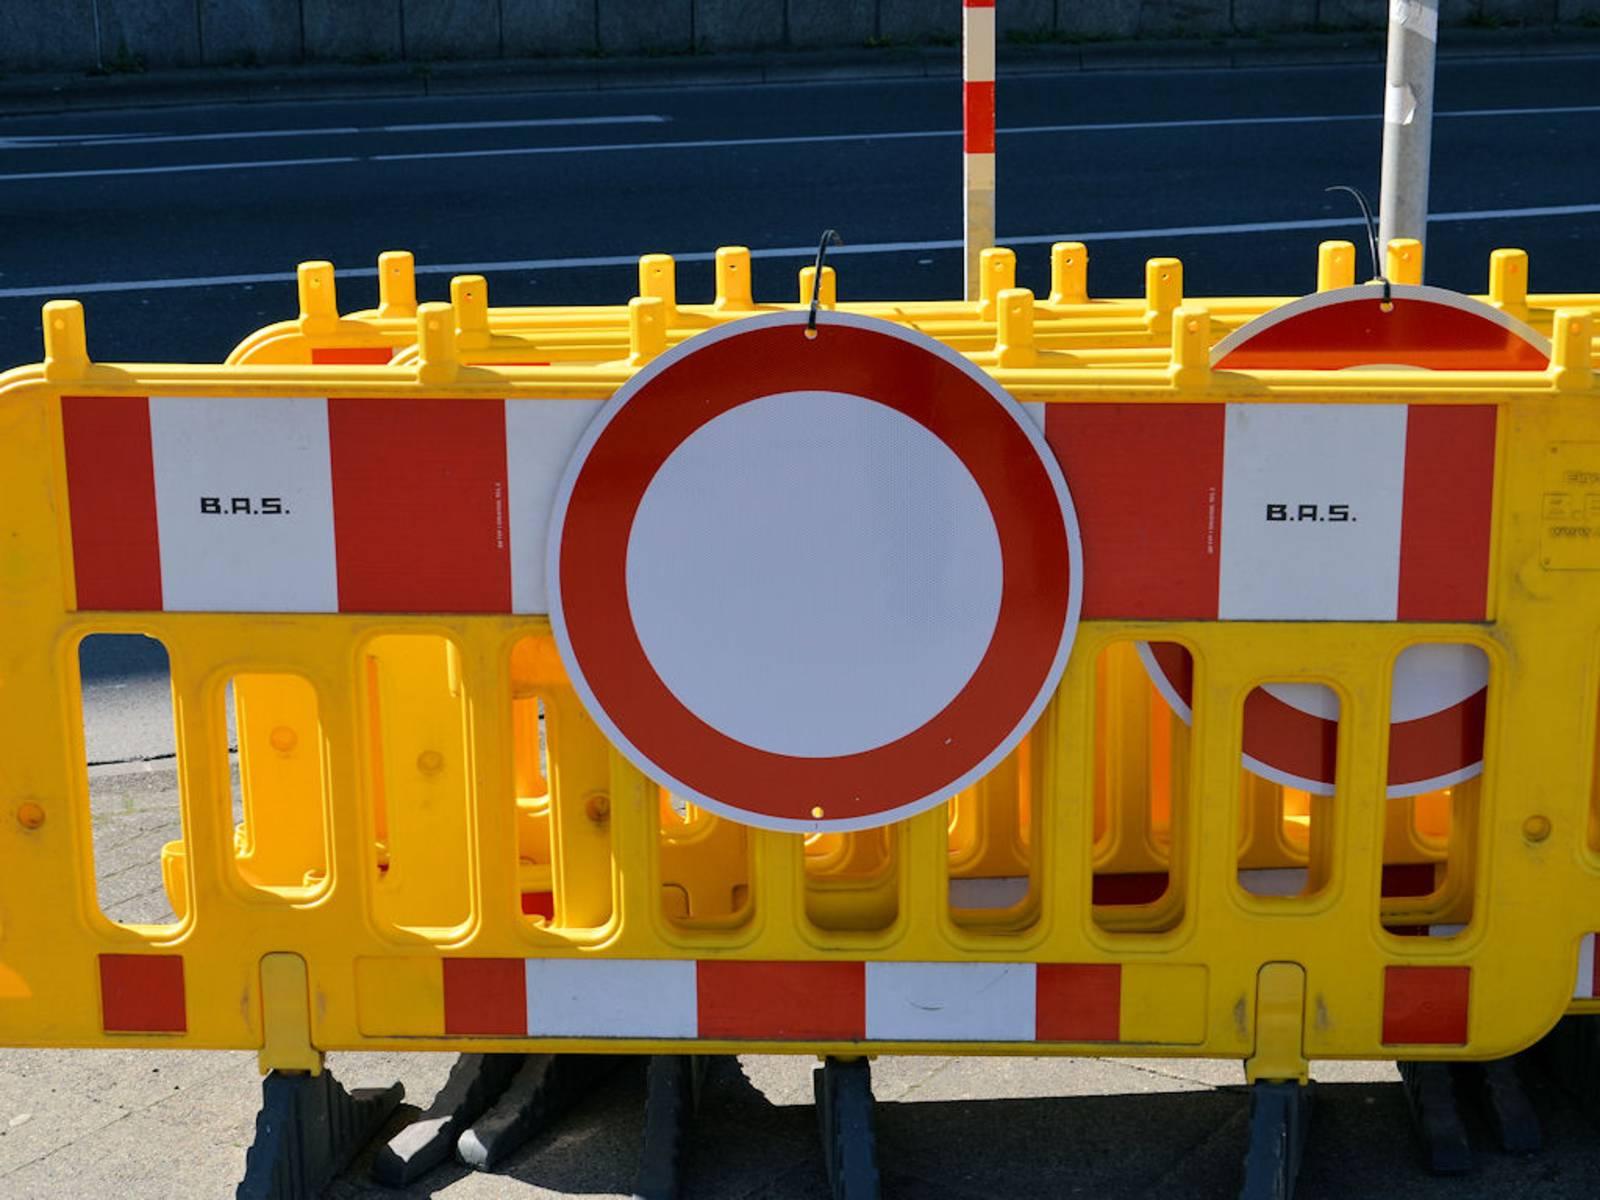 Verkehrsschild: Verbot für Fahrzeuge aller Art